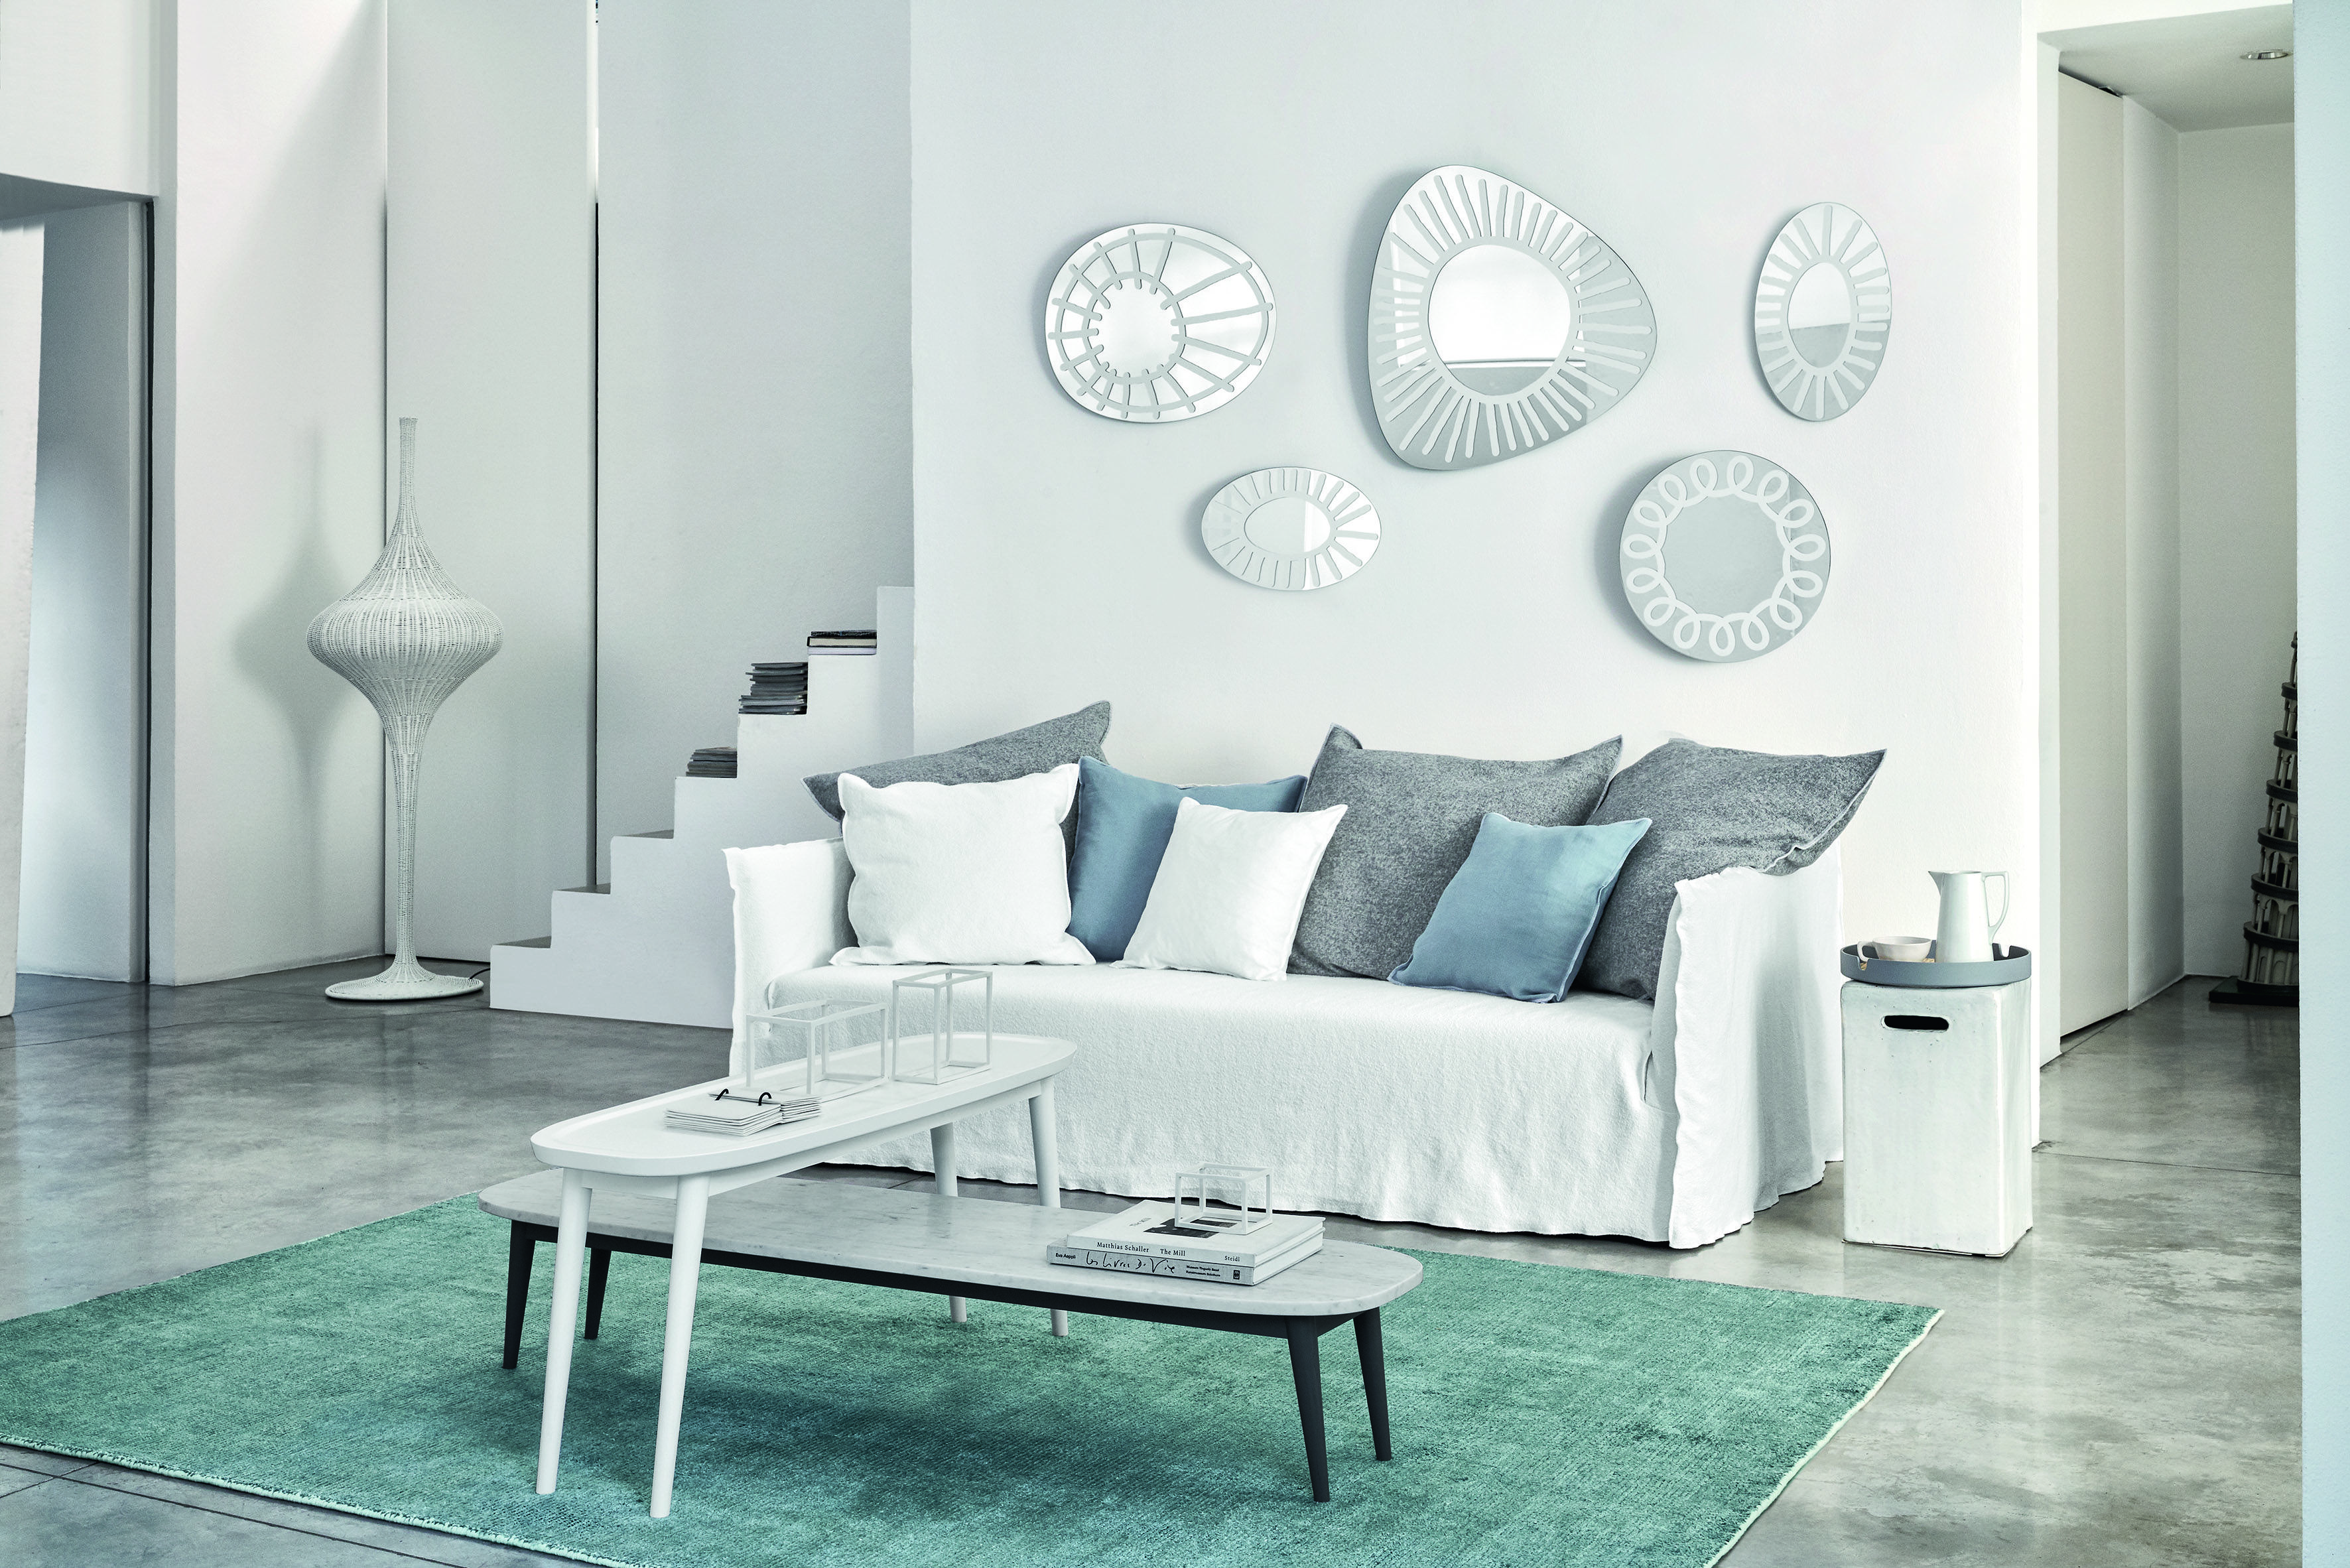 Design Paola Navone Annee 2018 Pays D Origine Italie Marque Gervasoni Canape Ghost 112 Gervasoni Meuble Haut De Gamme Mobilier De Salon Canape Diy